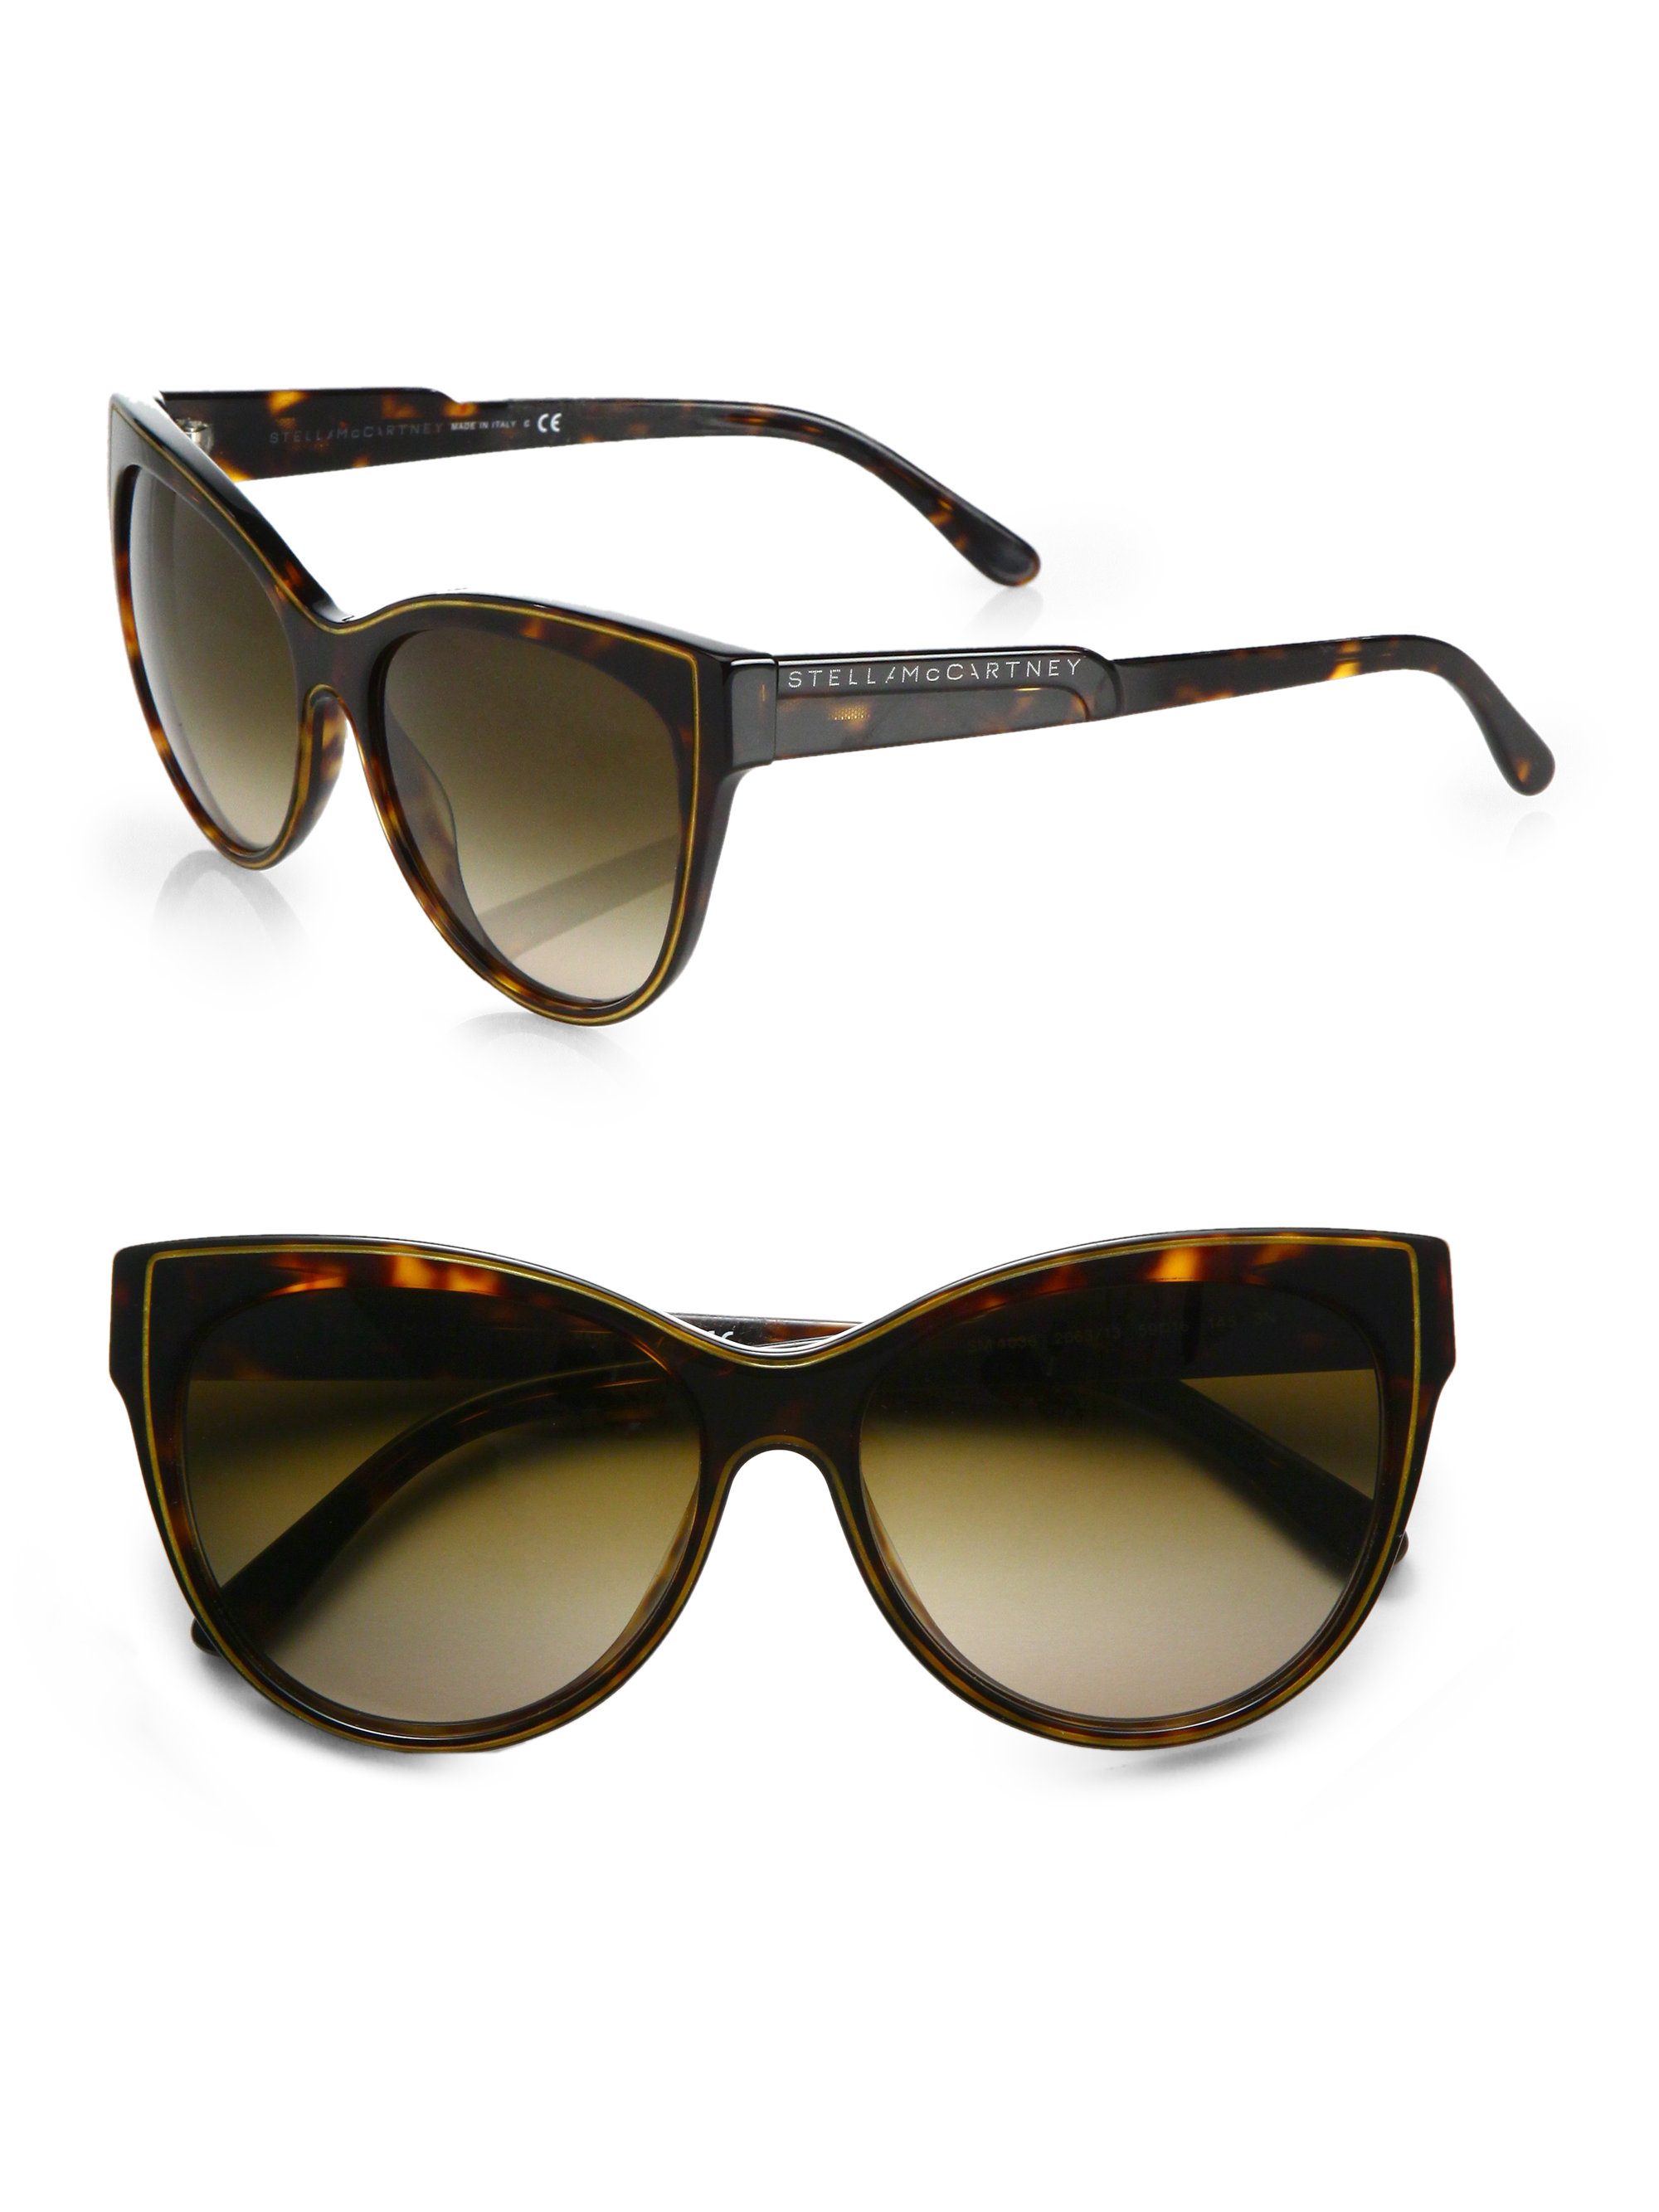 d07b086b33 Stella Mccartney Cat Eye Sunglasses